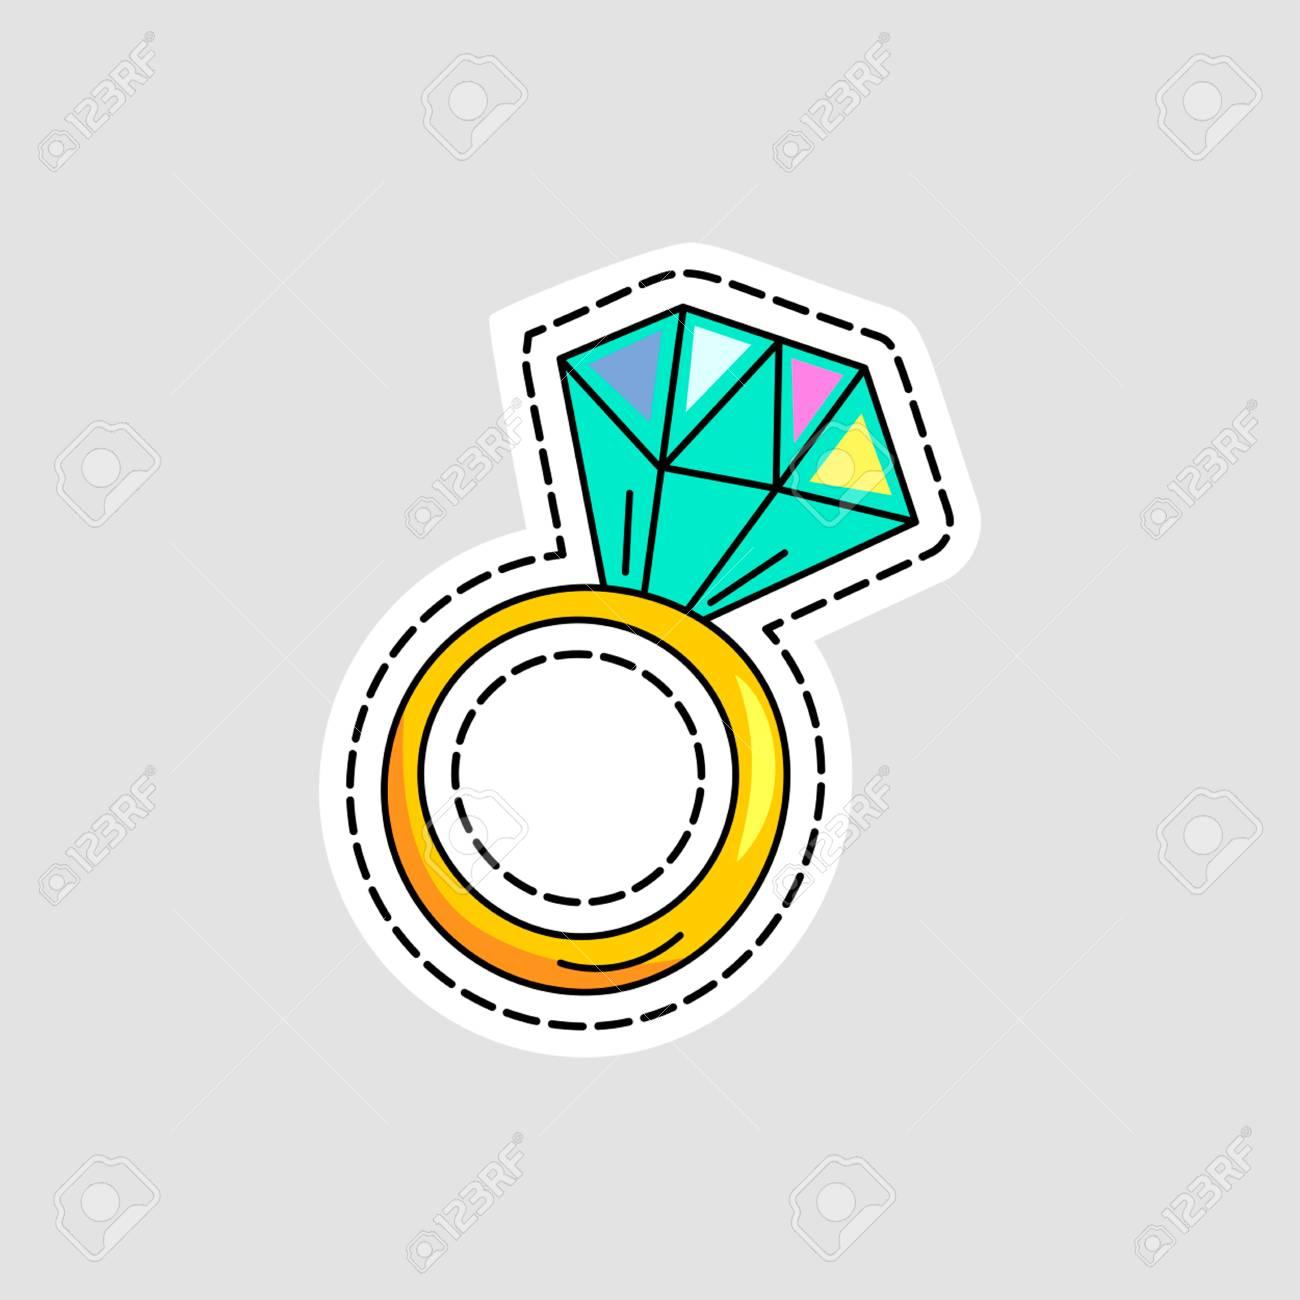 Anillo De Compromiso De Diamante En Un Estilo De Dibujos Animados